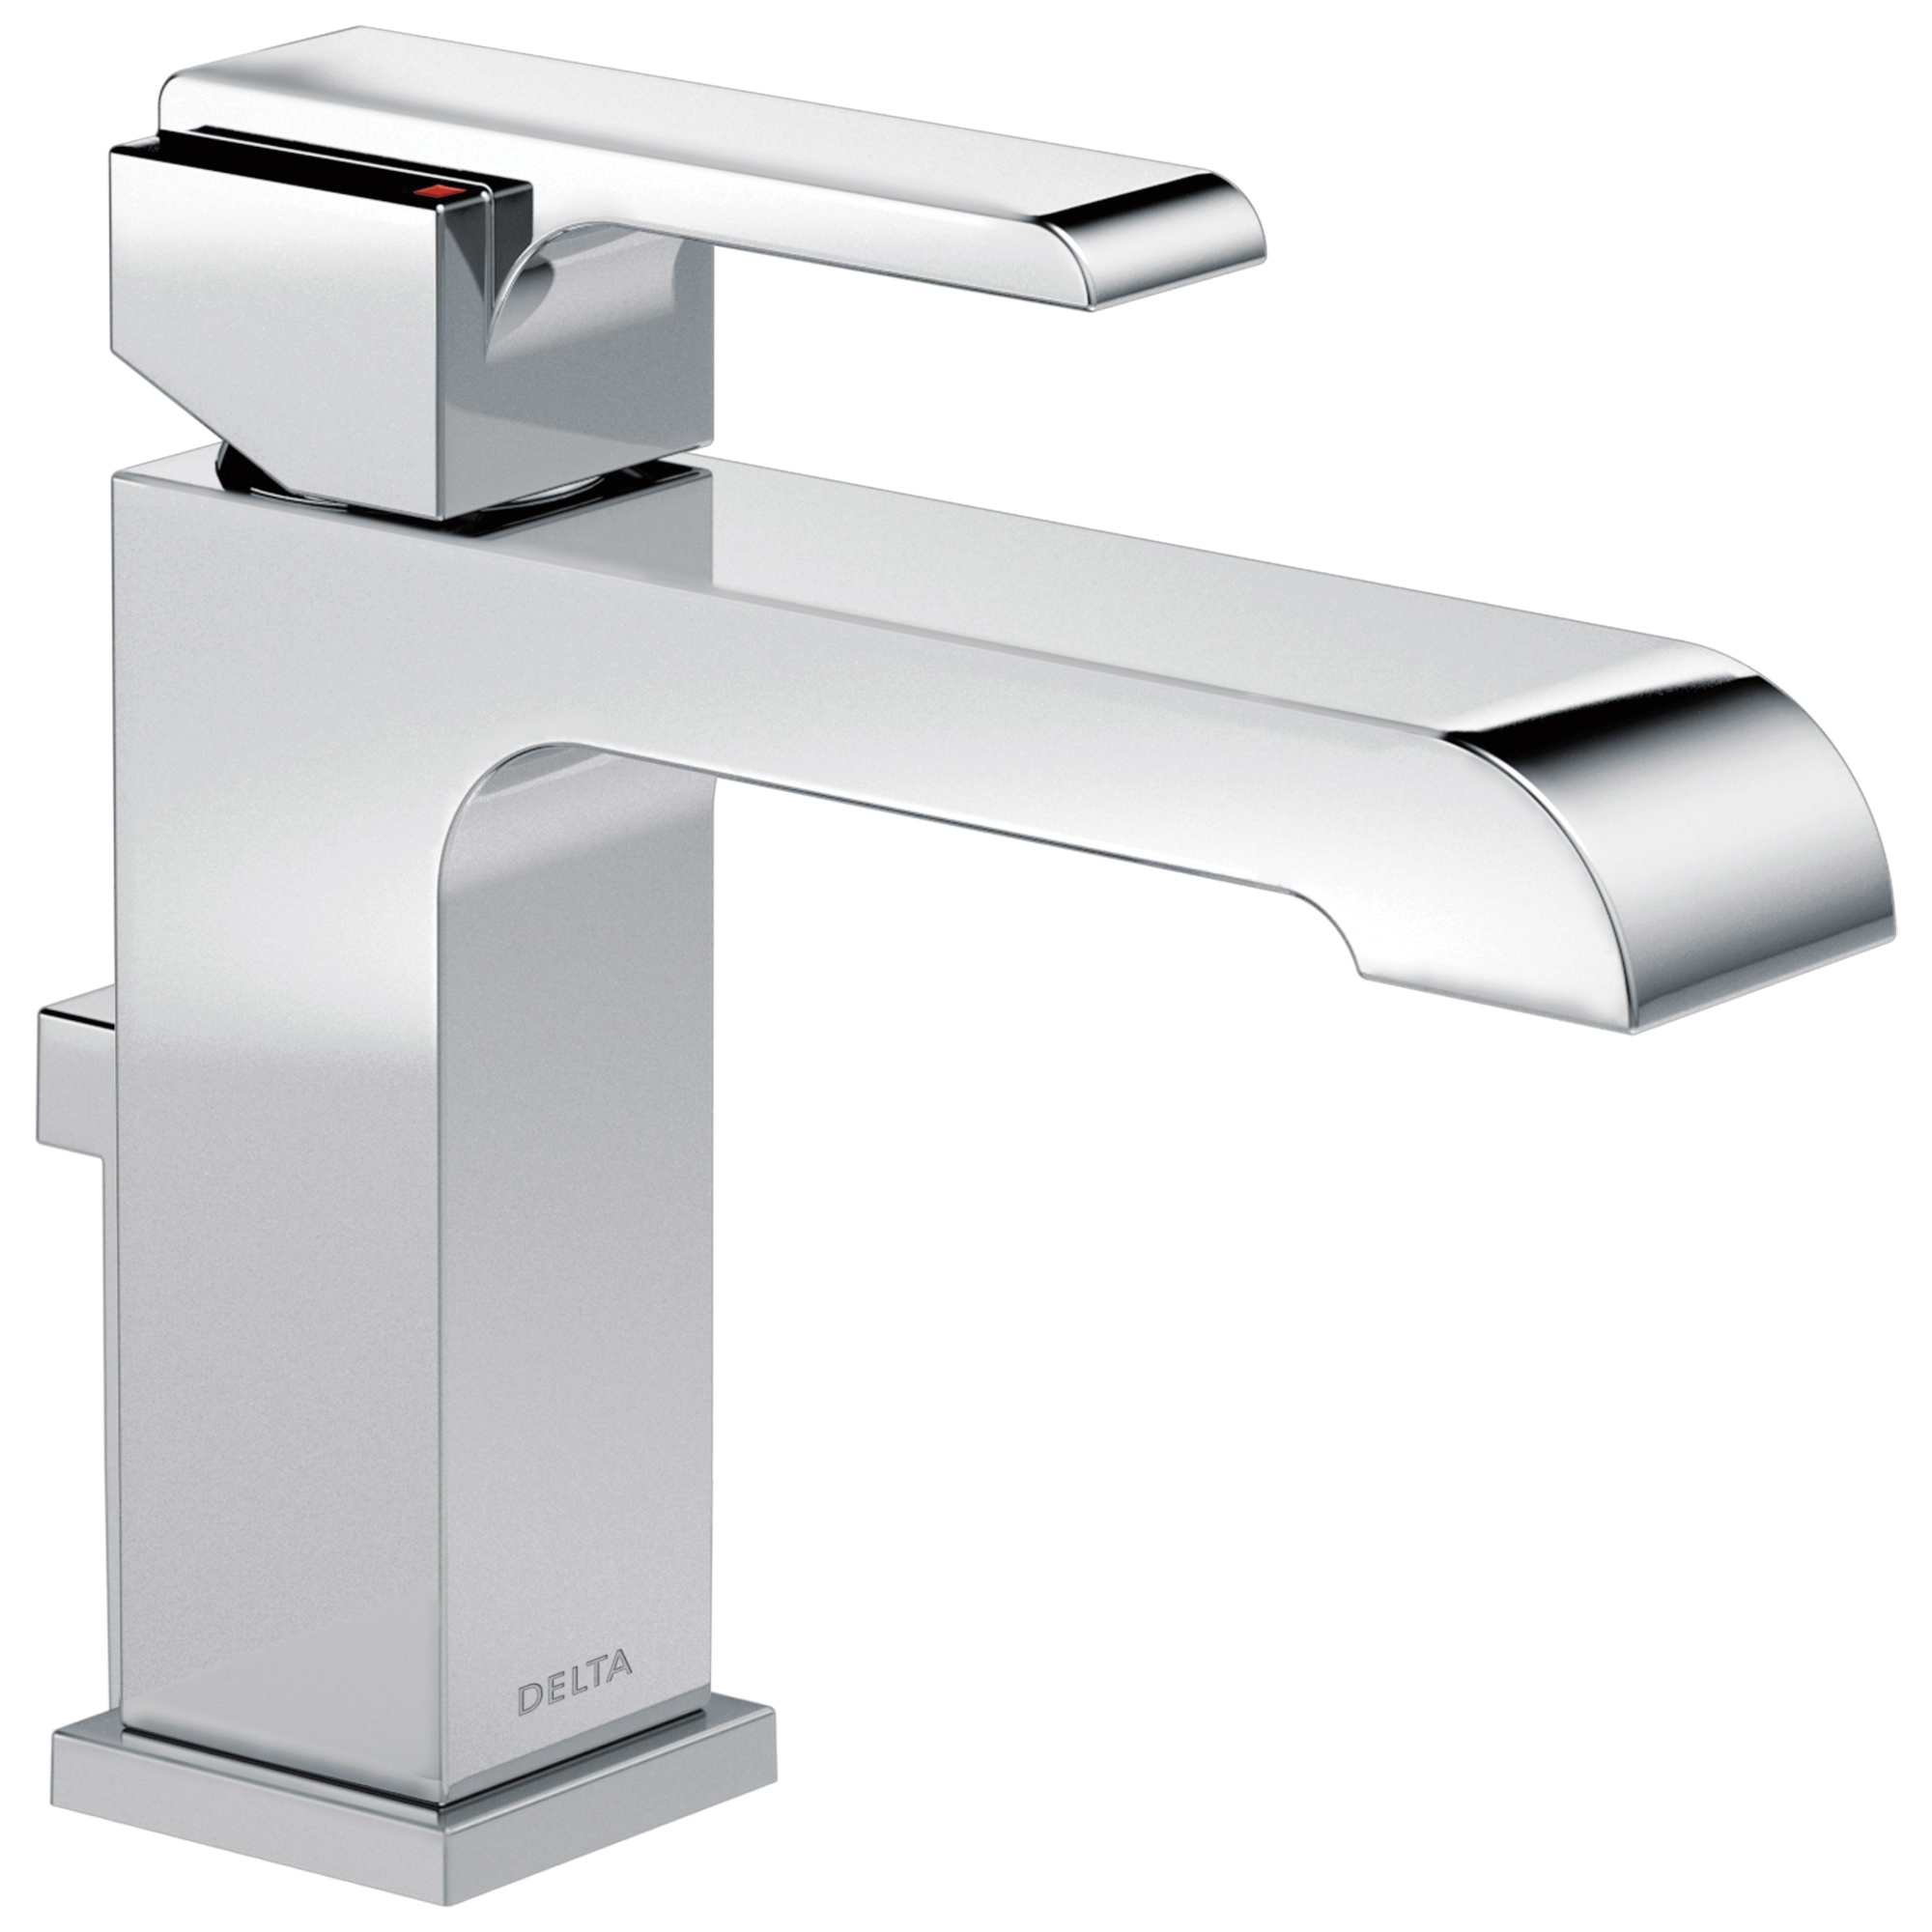 DELTA® 567LF-GPM-MPU Centerset Lavatory Faucet, Ara®, Chrome Plated, 1 Handles, Metal Pop-Up Drain, 1 gpm